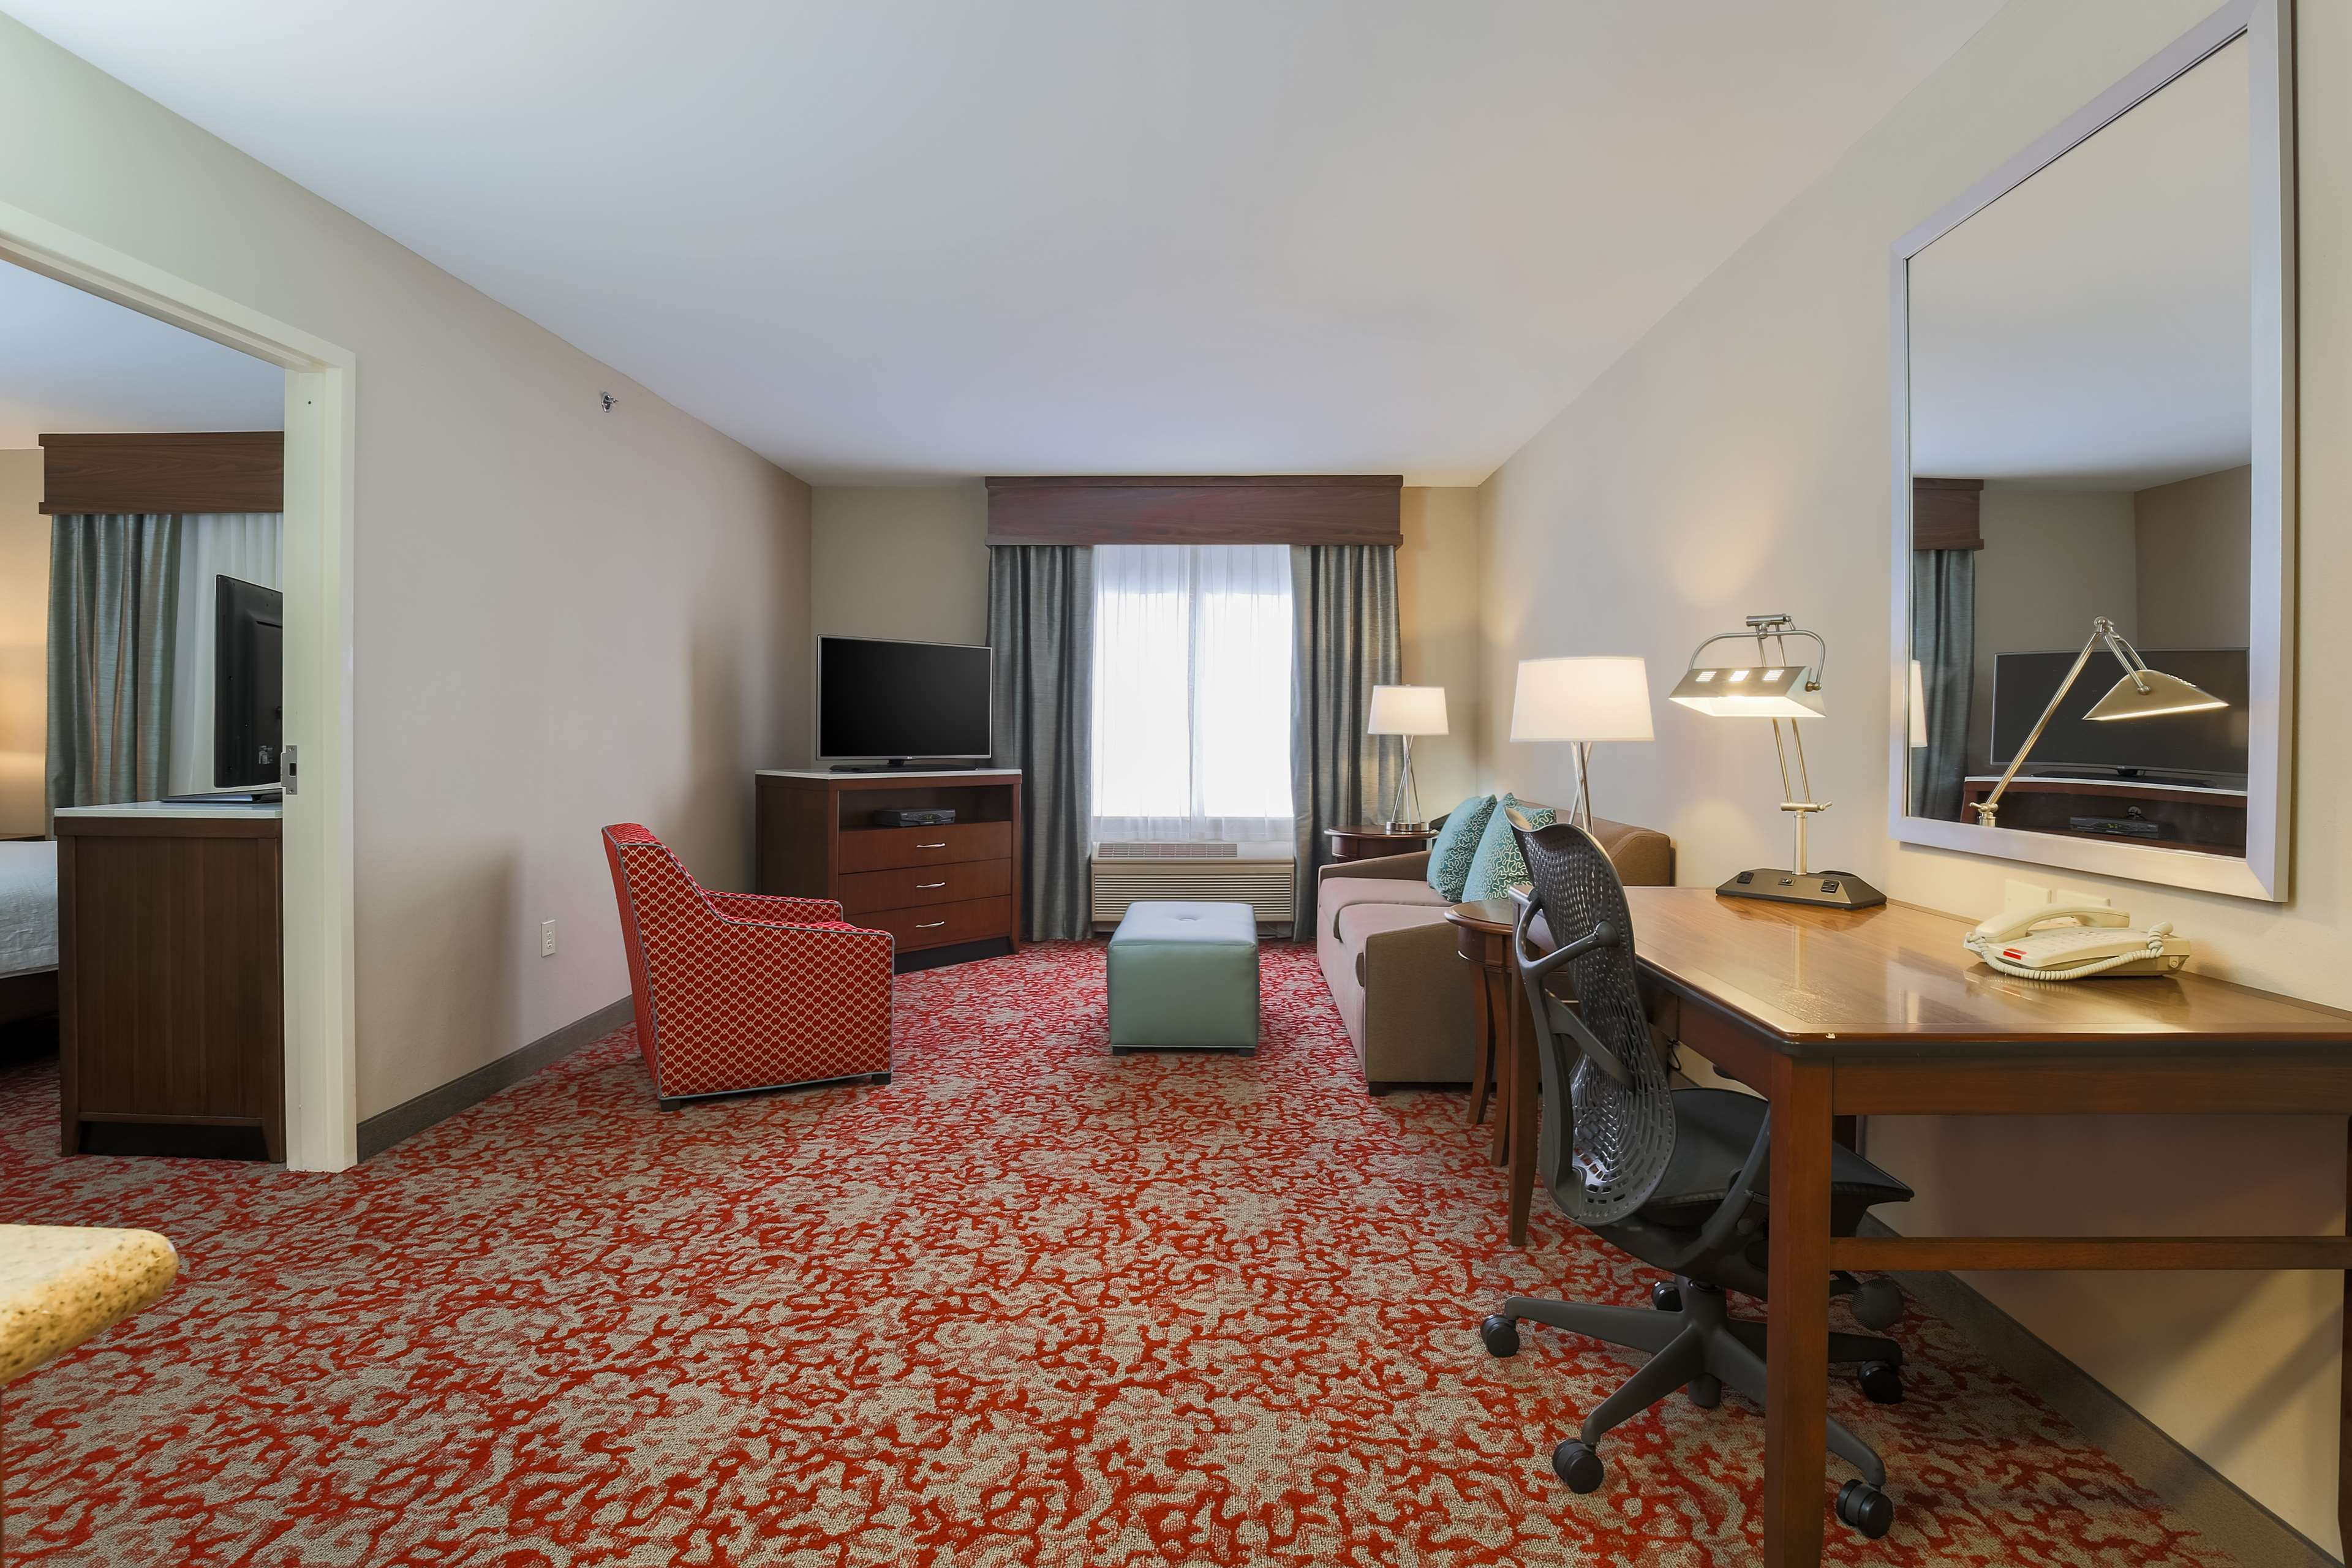 Hilton Garden Inn Nanuet image 16